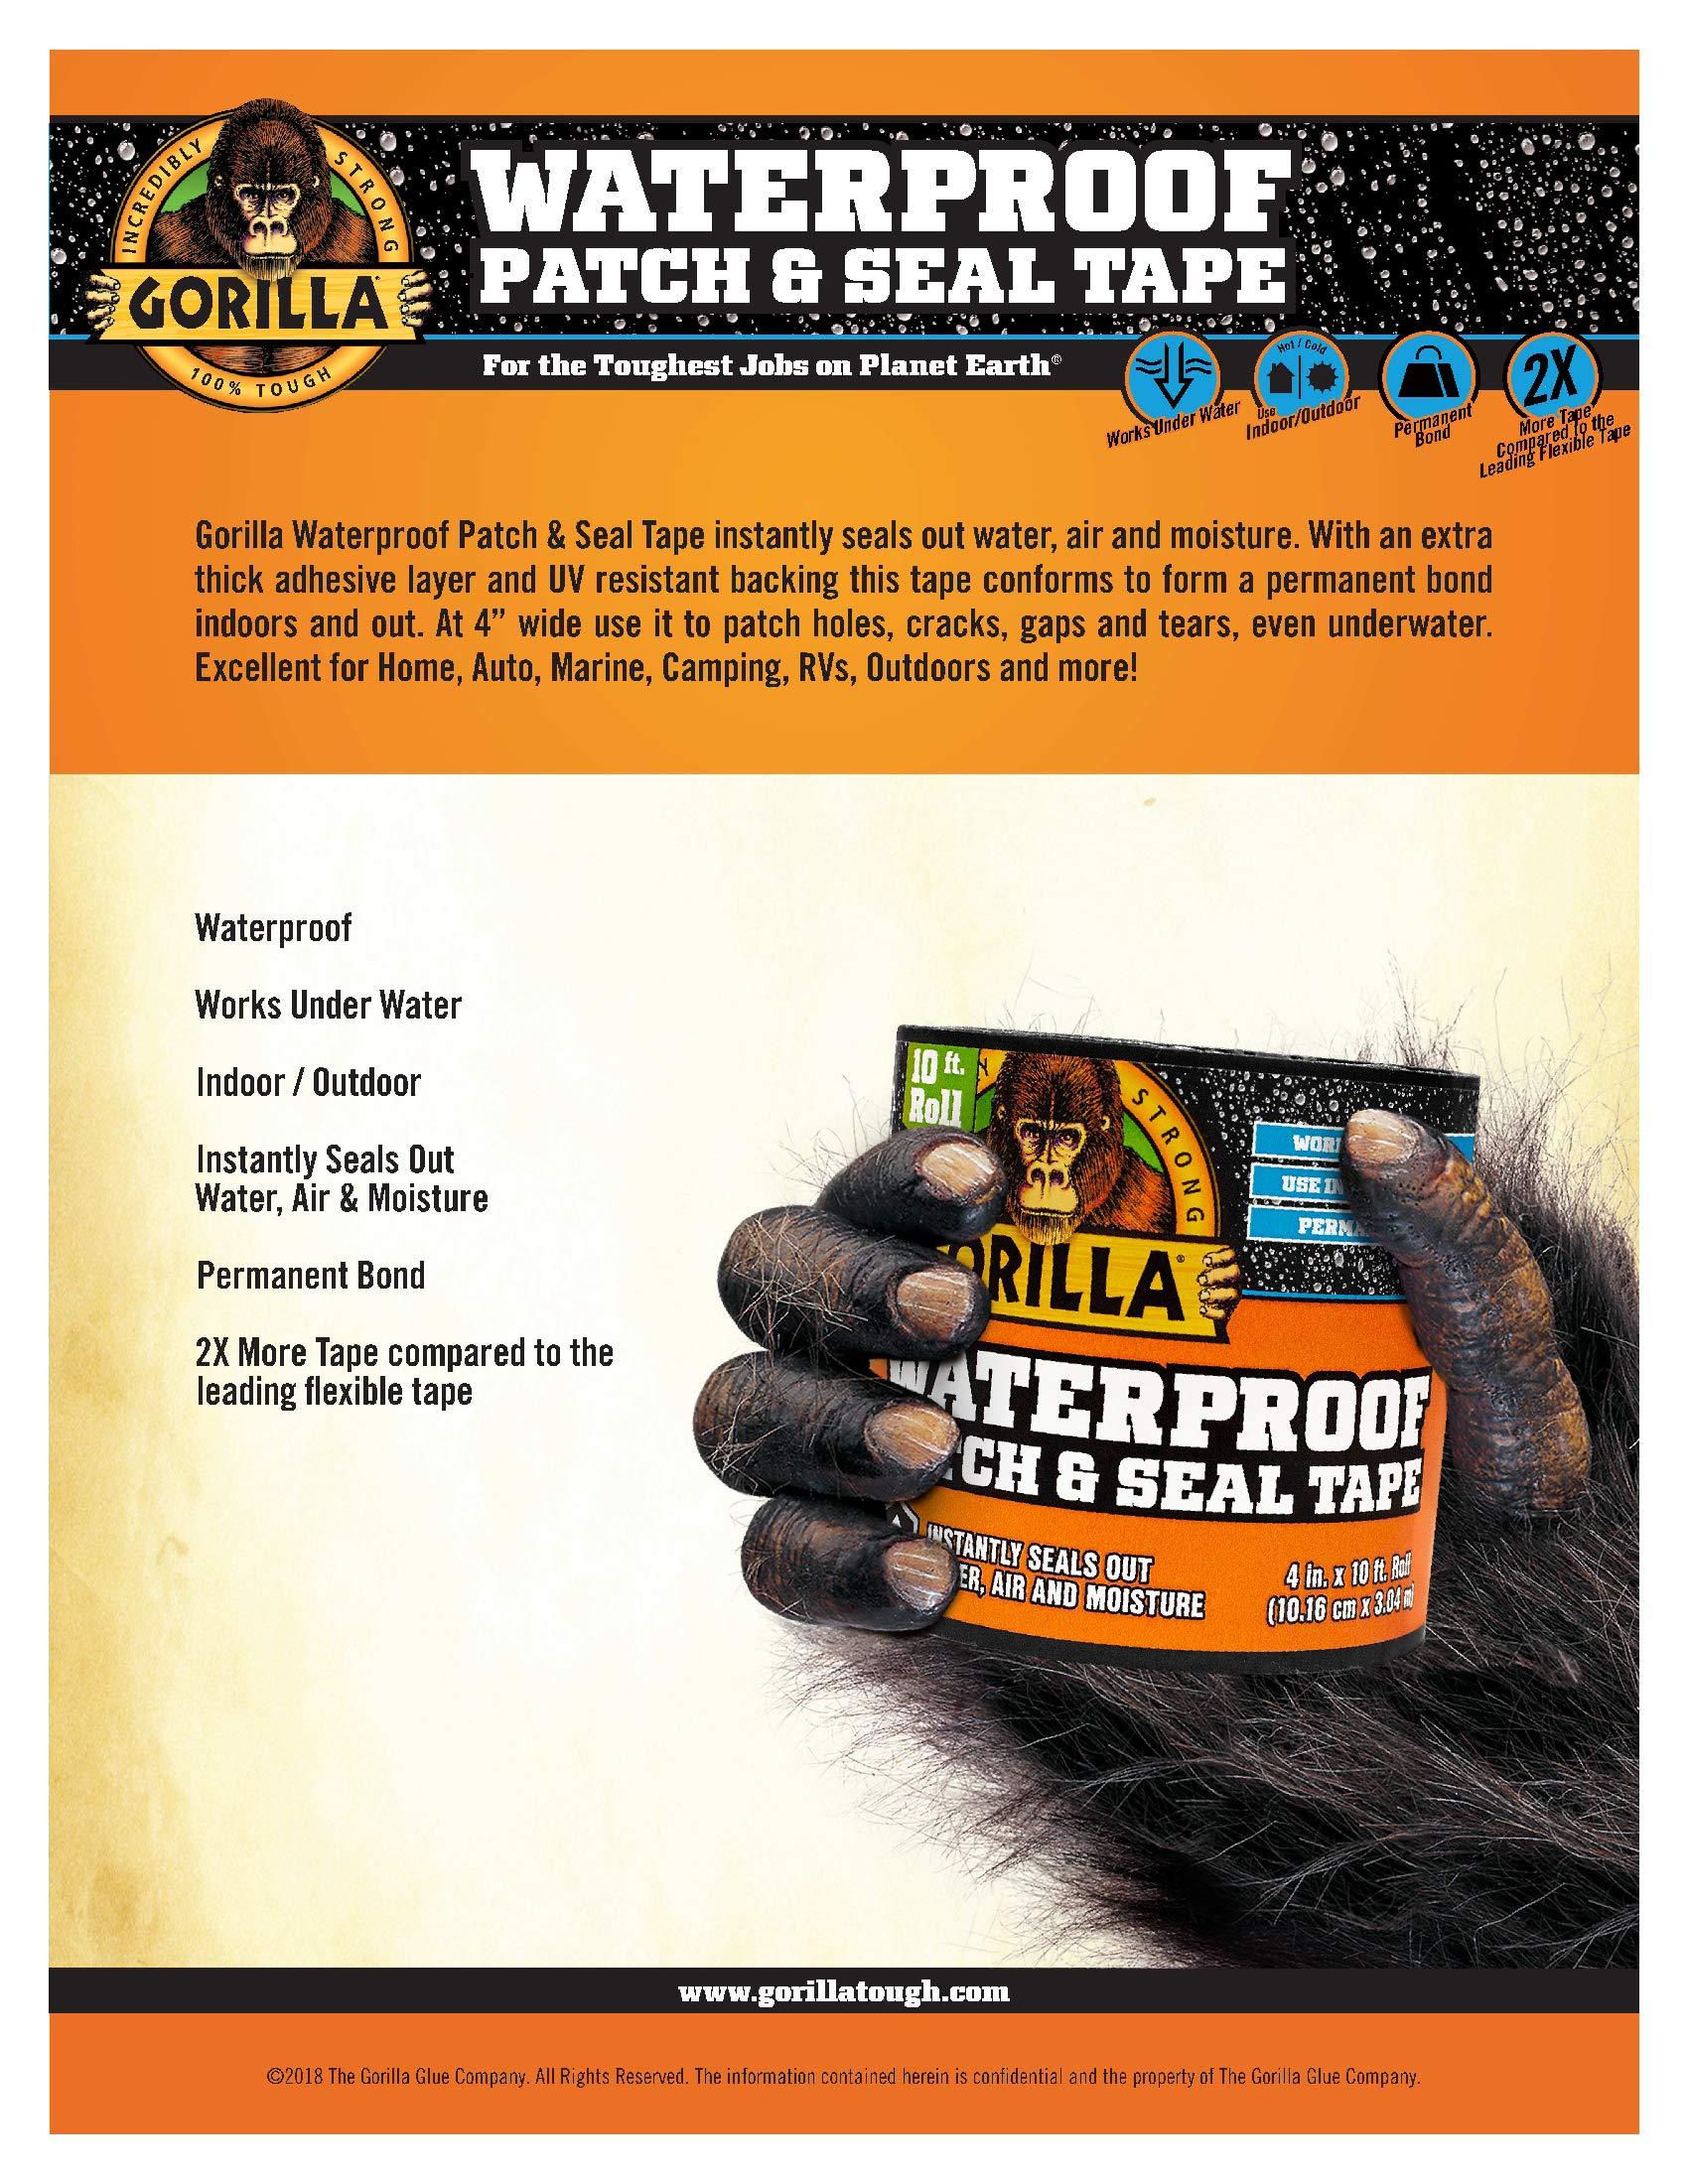 Gorilla 4612502DF Waterproof Patch & Seal Tape, 4 - Pack, Black